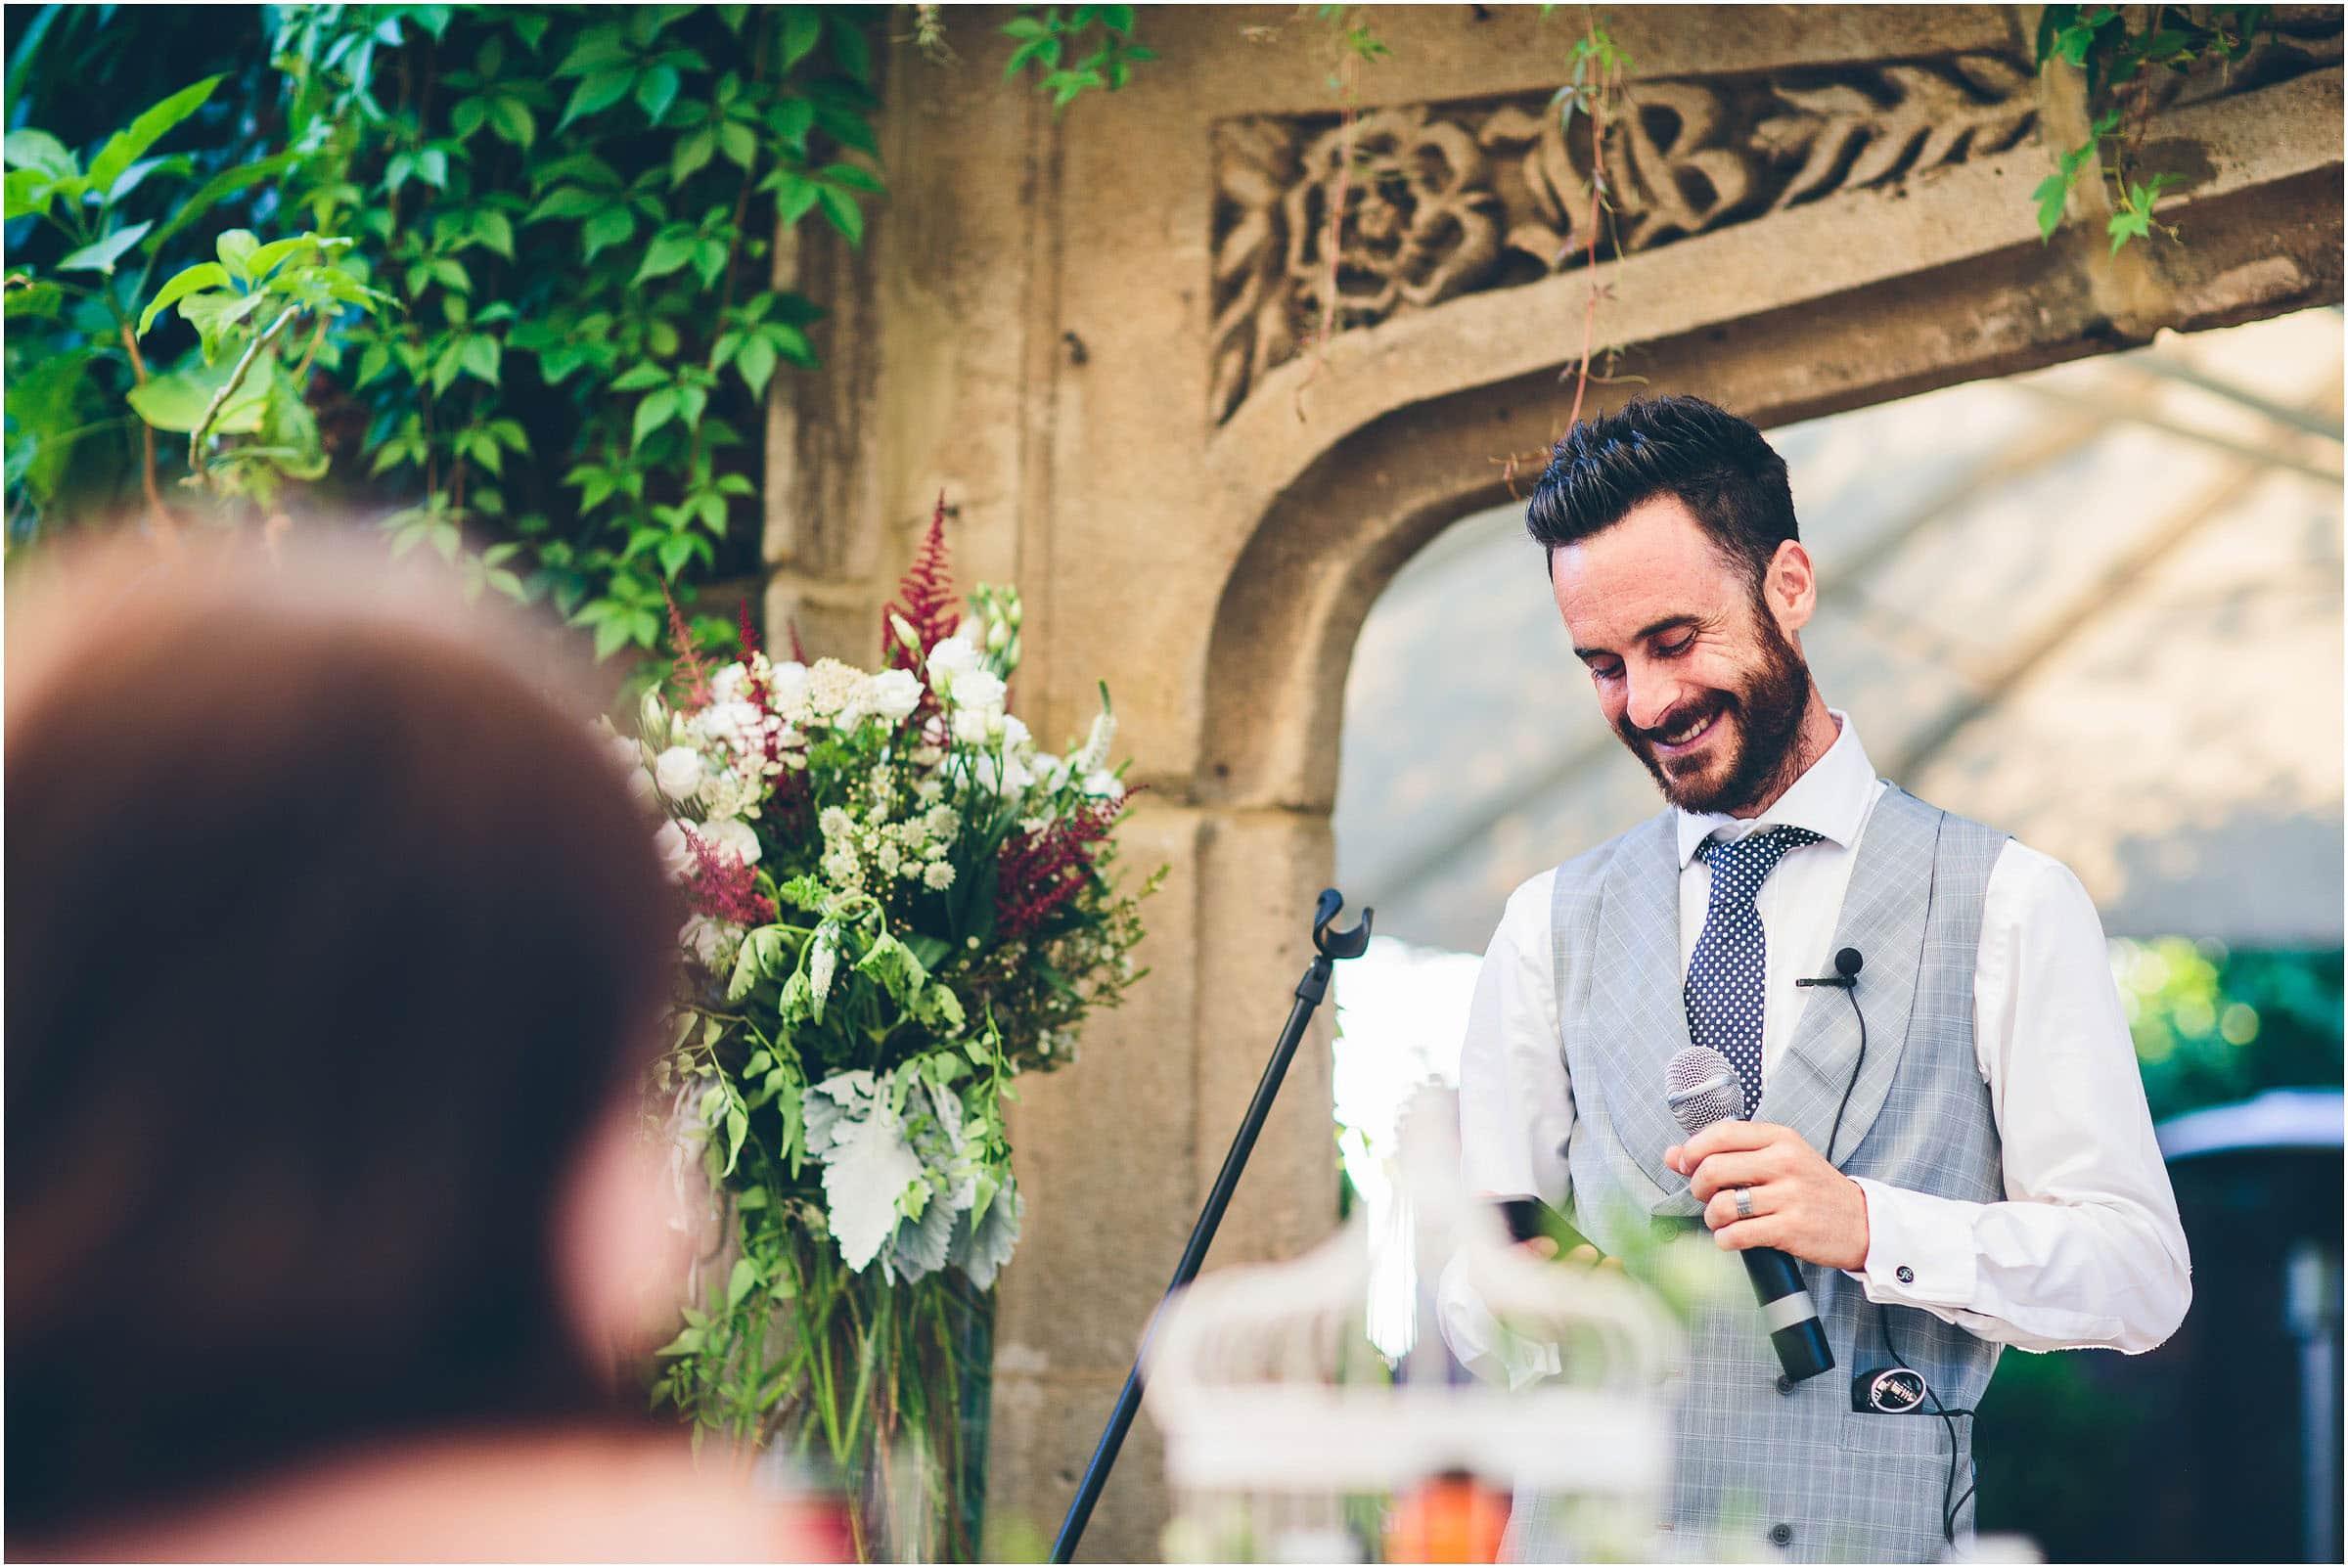 Kensington_Roof_Gardens_Wedding_Photography_0101